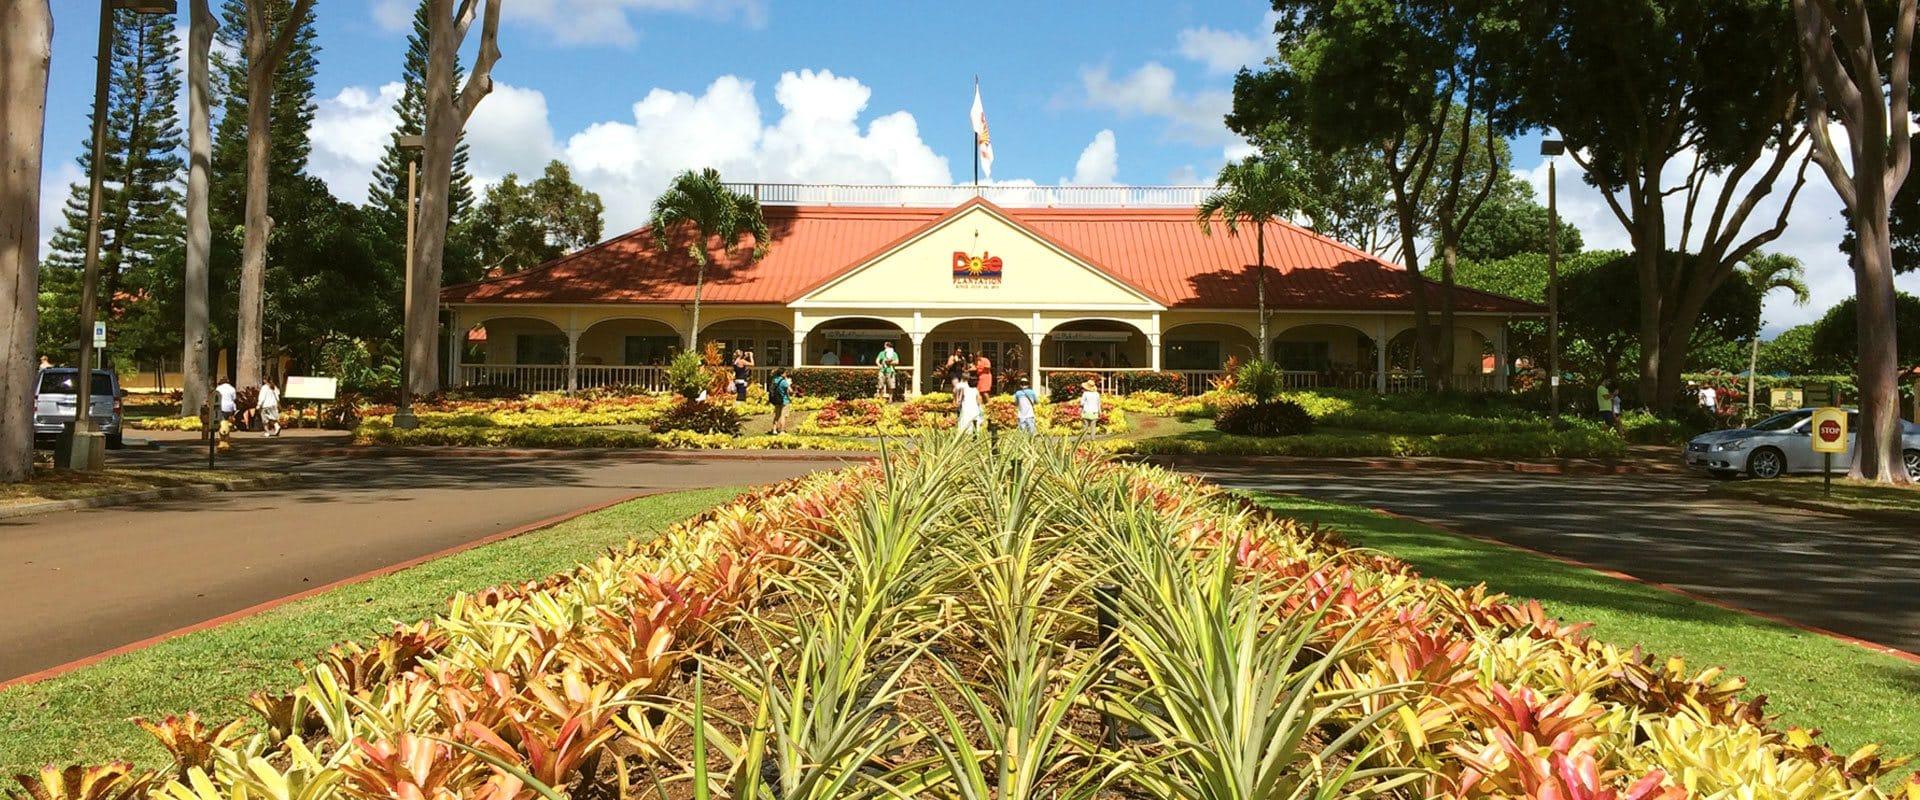 Dole Plantation Hawaii's Pineapple Experience